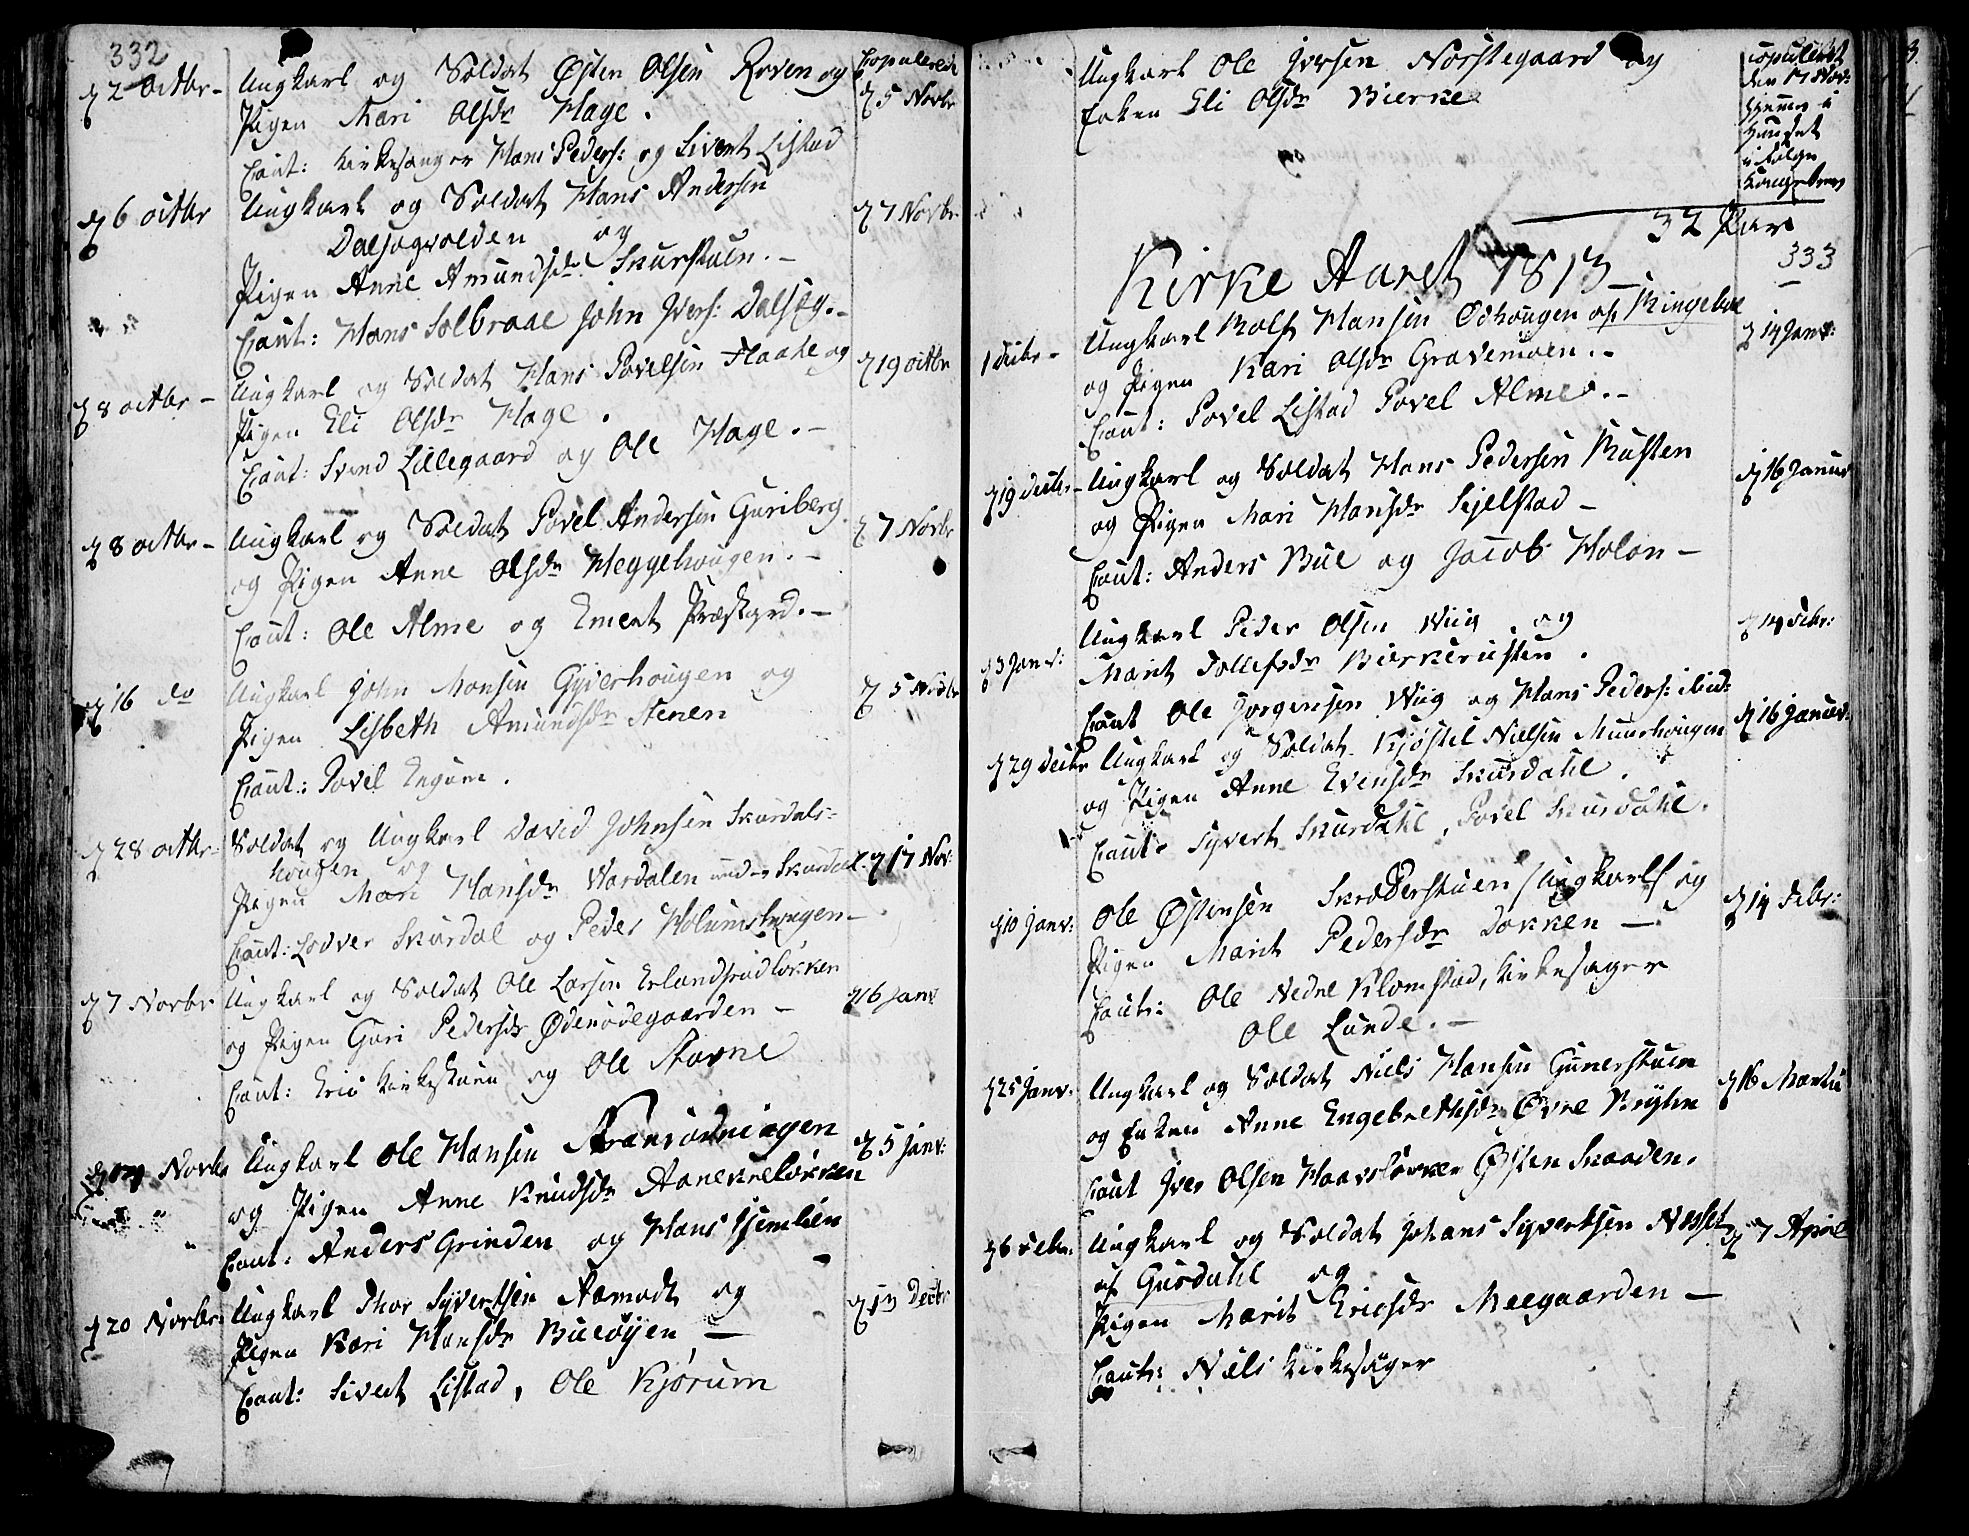 SAH, Fron prestekontor, H/Ha/Haa/L0001: Ministerialbok nr. 1, 1799-1816, s. 332-333